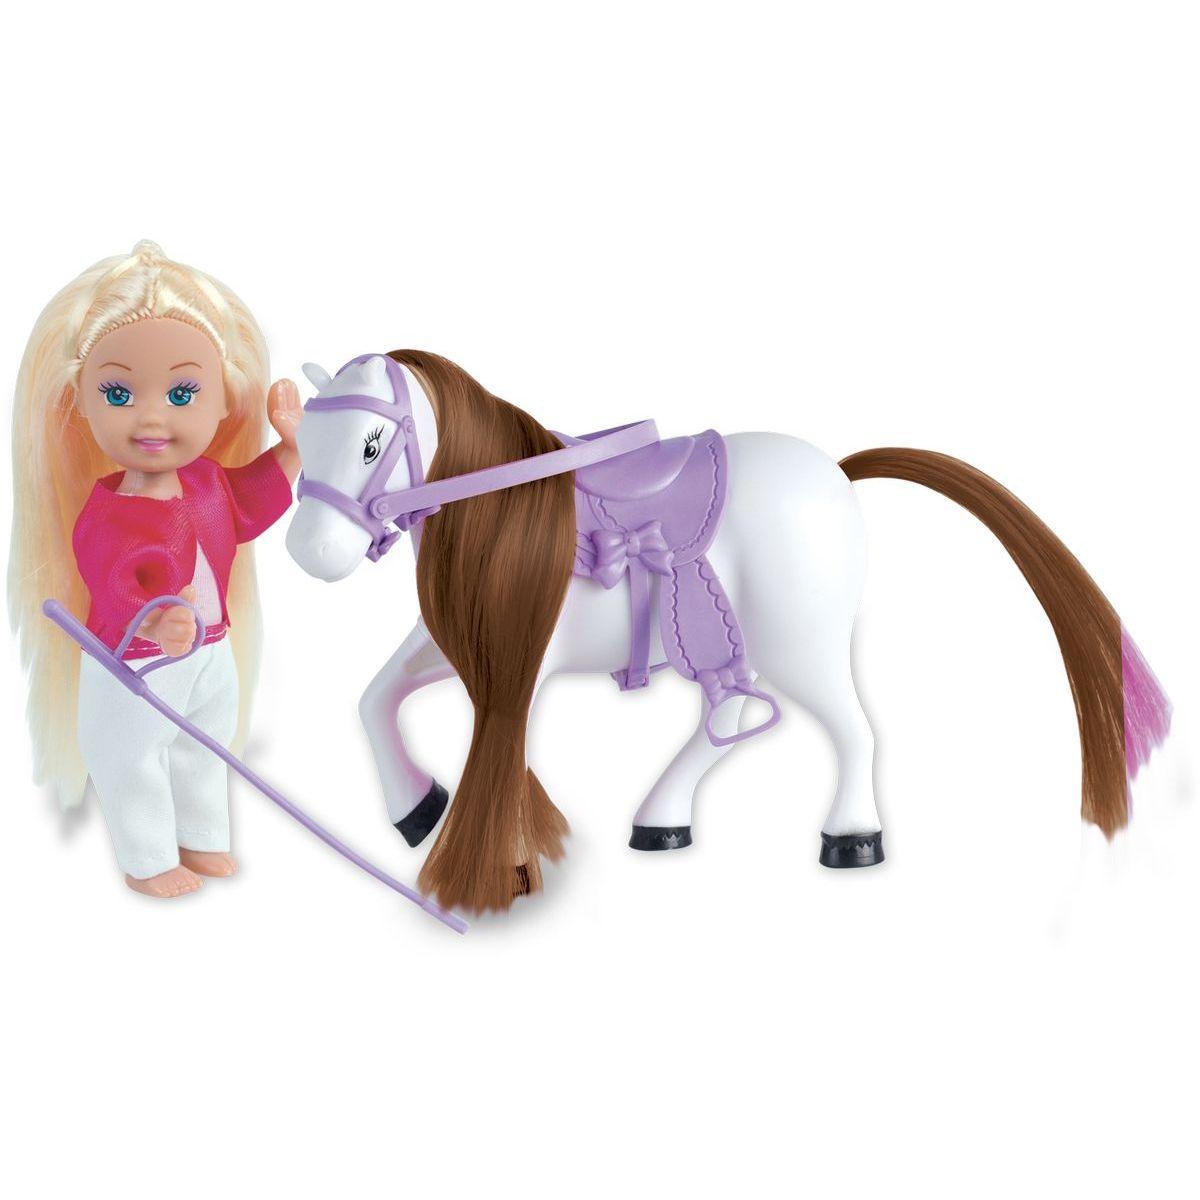 HM Studio Bábika Katka s koňom